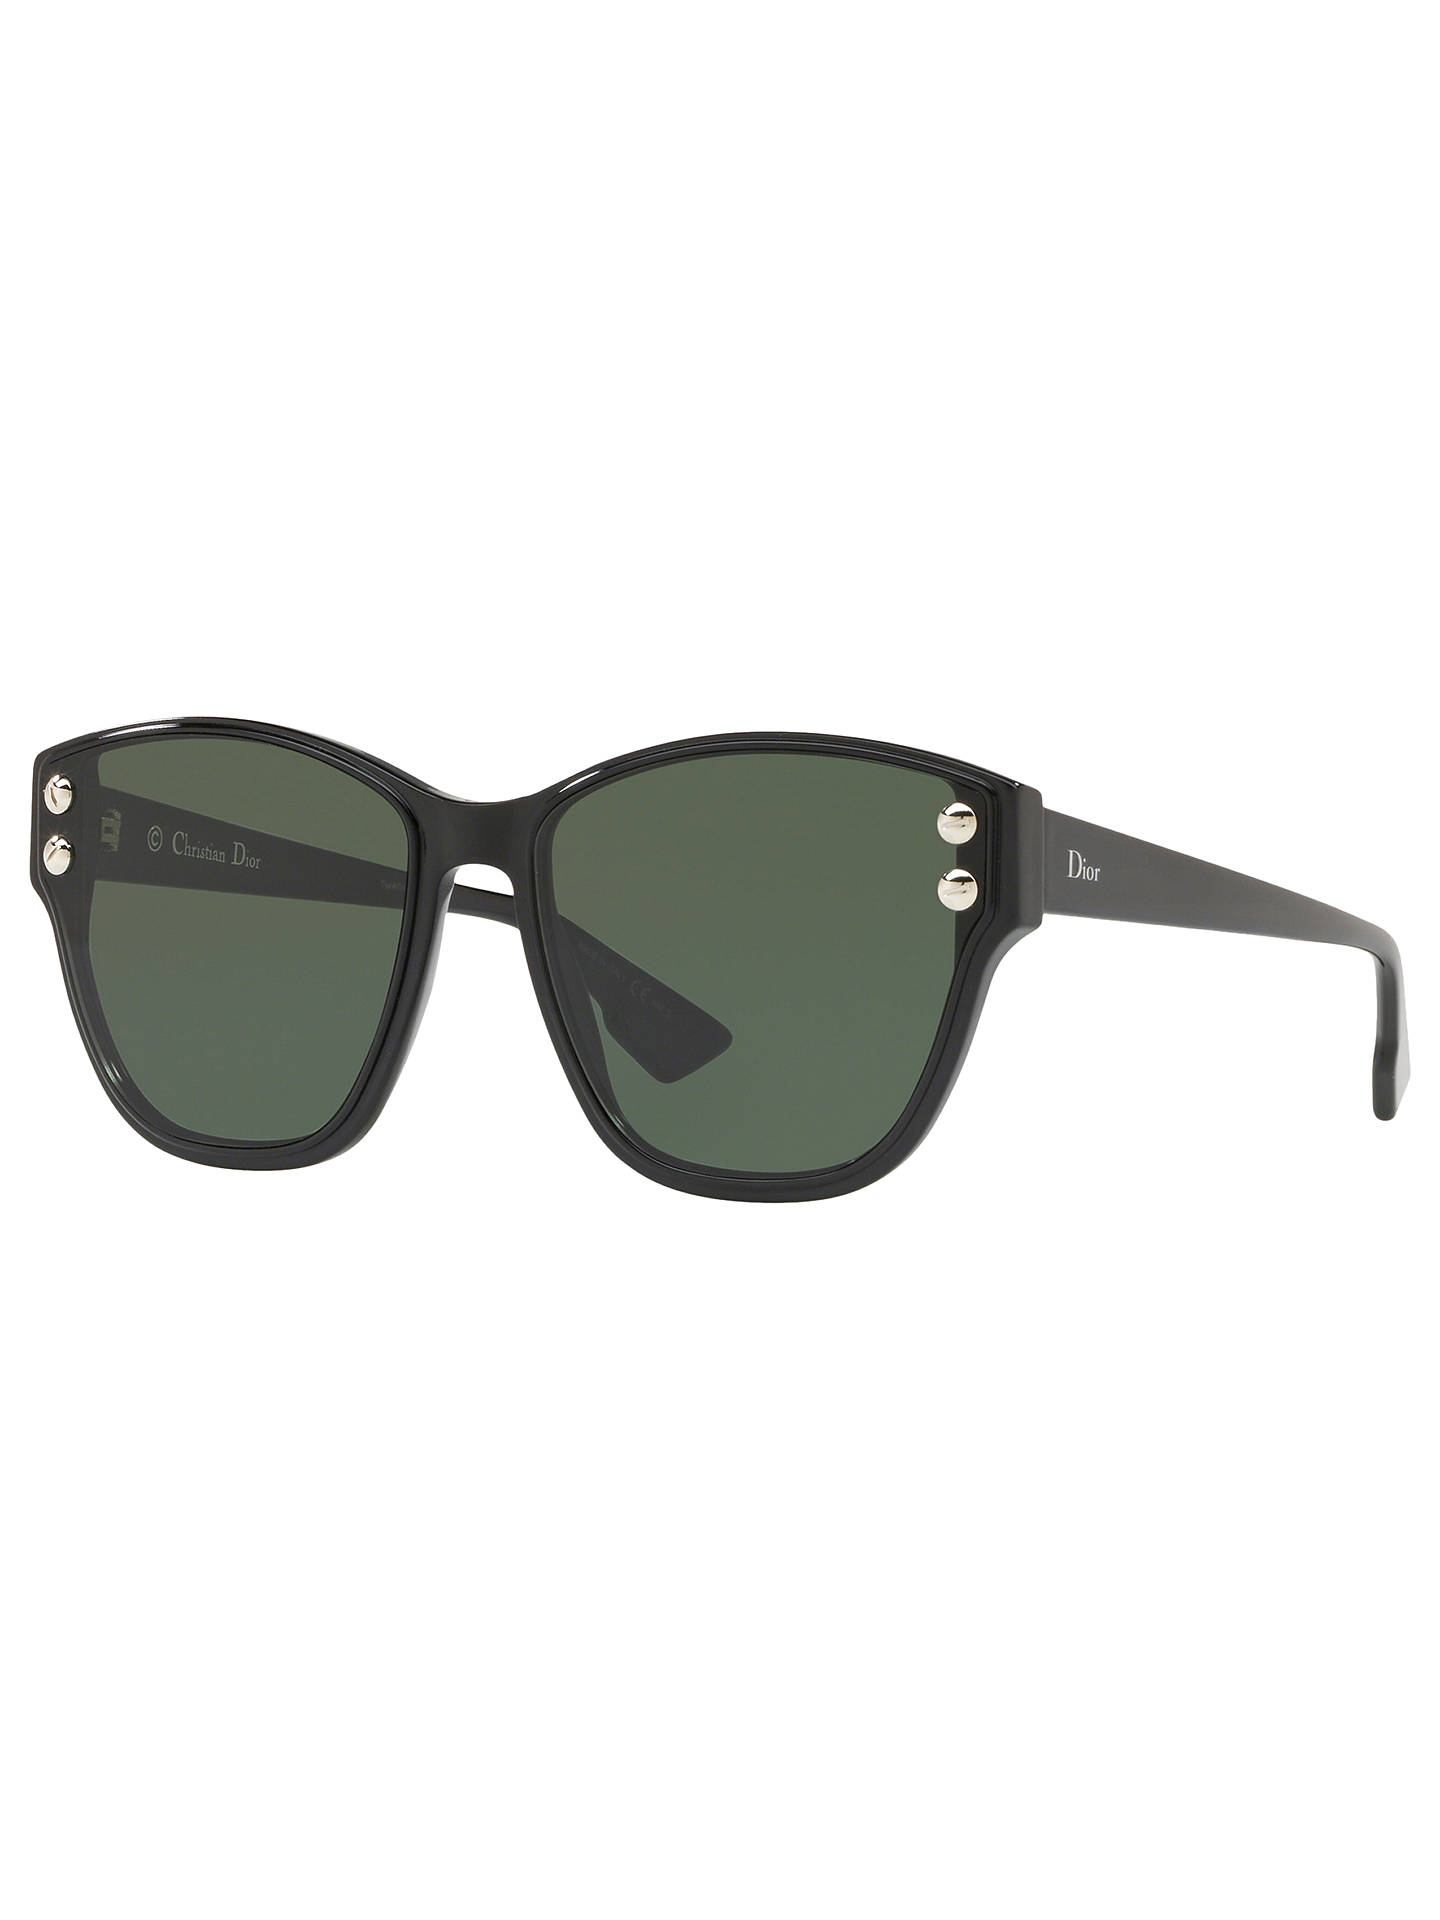 583459756cb6 Buy Dior DiorAddict3 Women's Polarised Cat's Eye Sunglasses, Black/Green  Online at johnlewis.